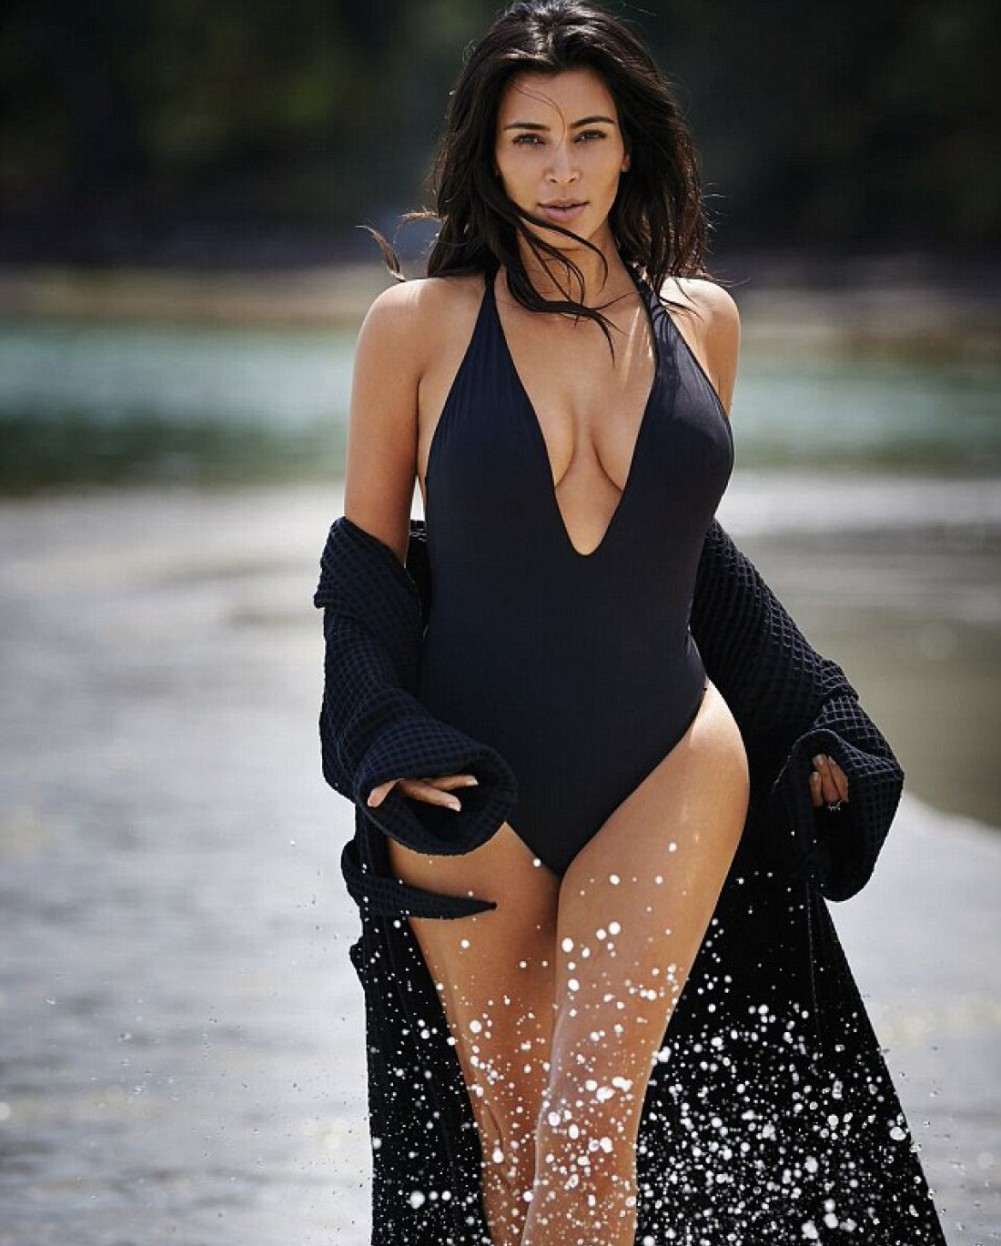 жена без белья на улице фото